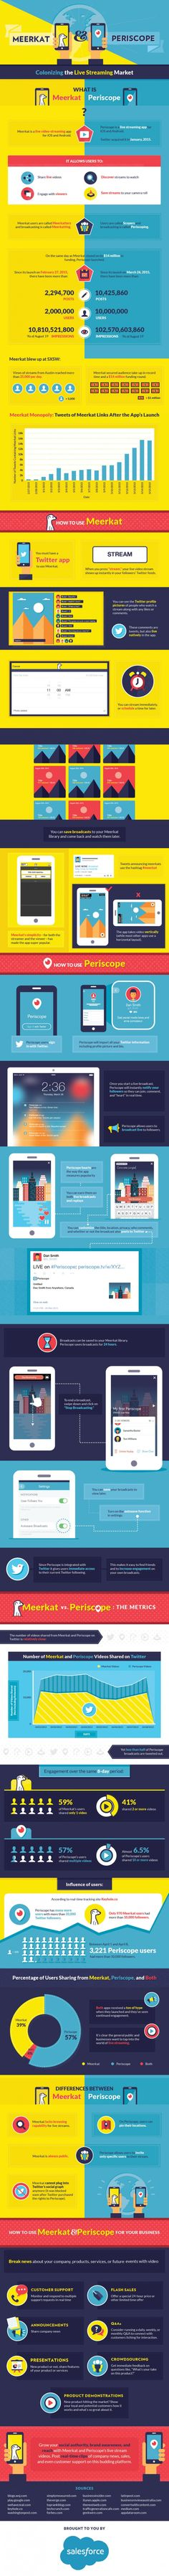 Wie man Meerkat und Periscope nutzt #Meerkat & #Periscope Colinizing the Live Streaming Market